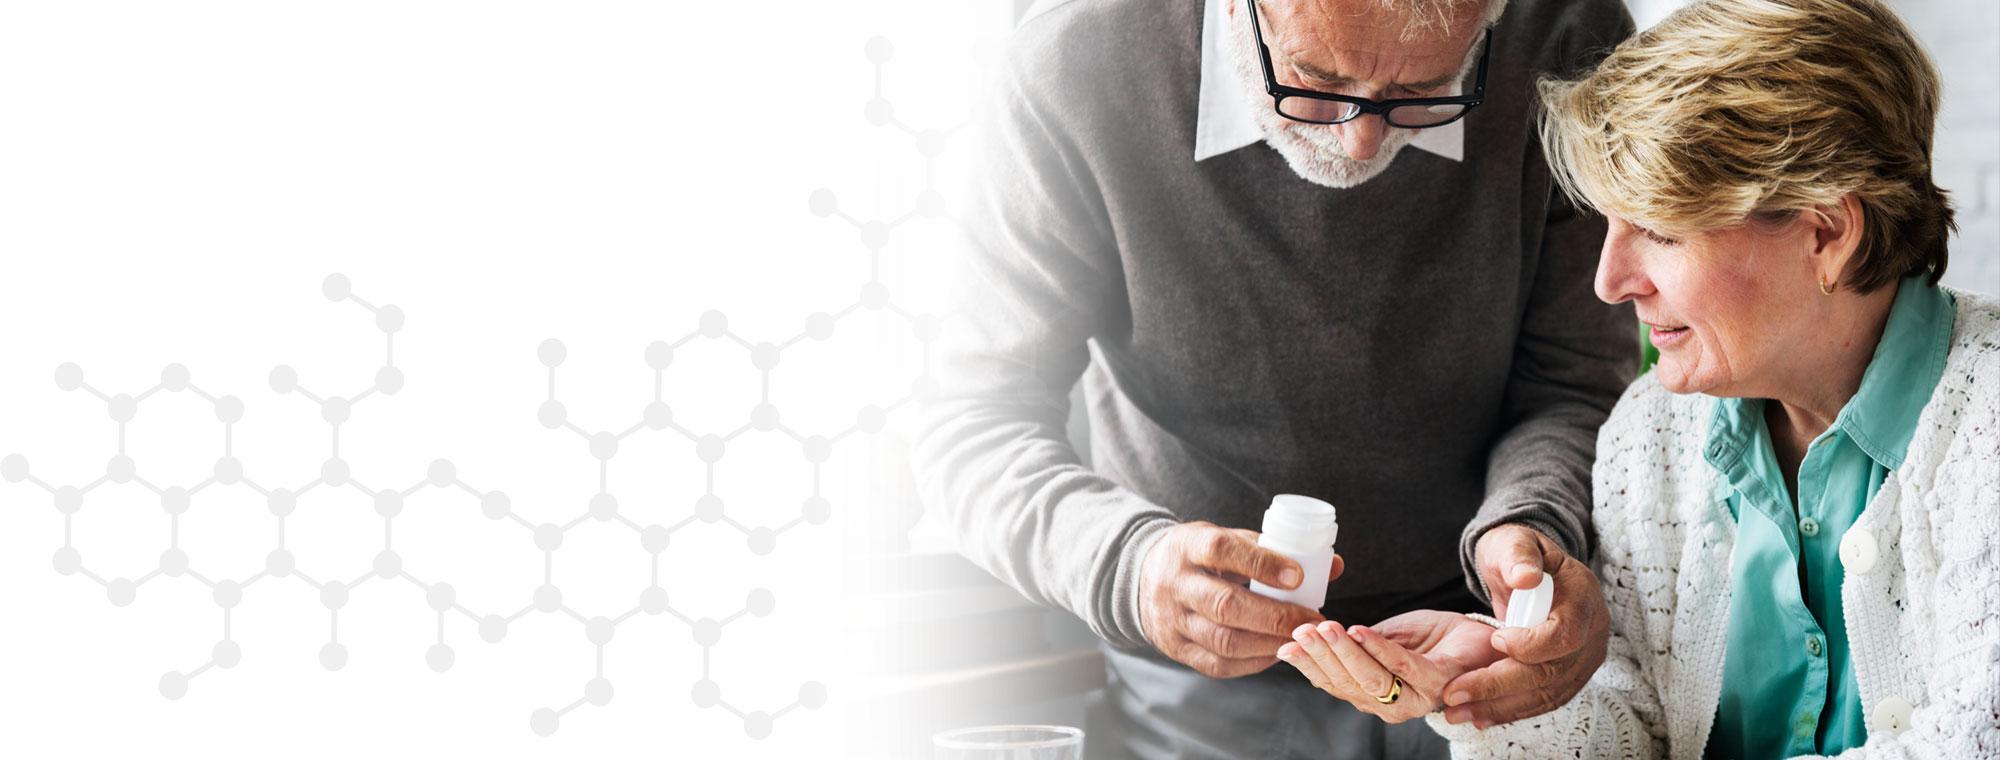 Canadian International Pharmacy Associaton